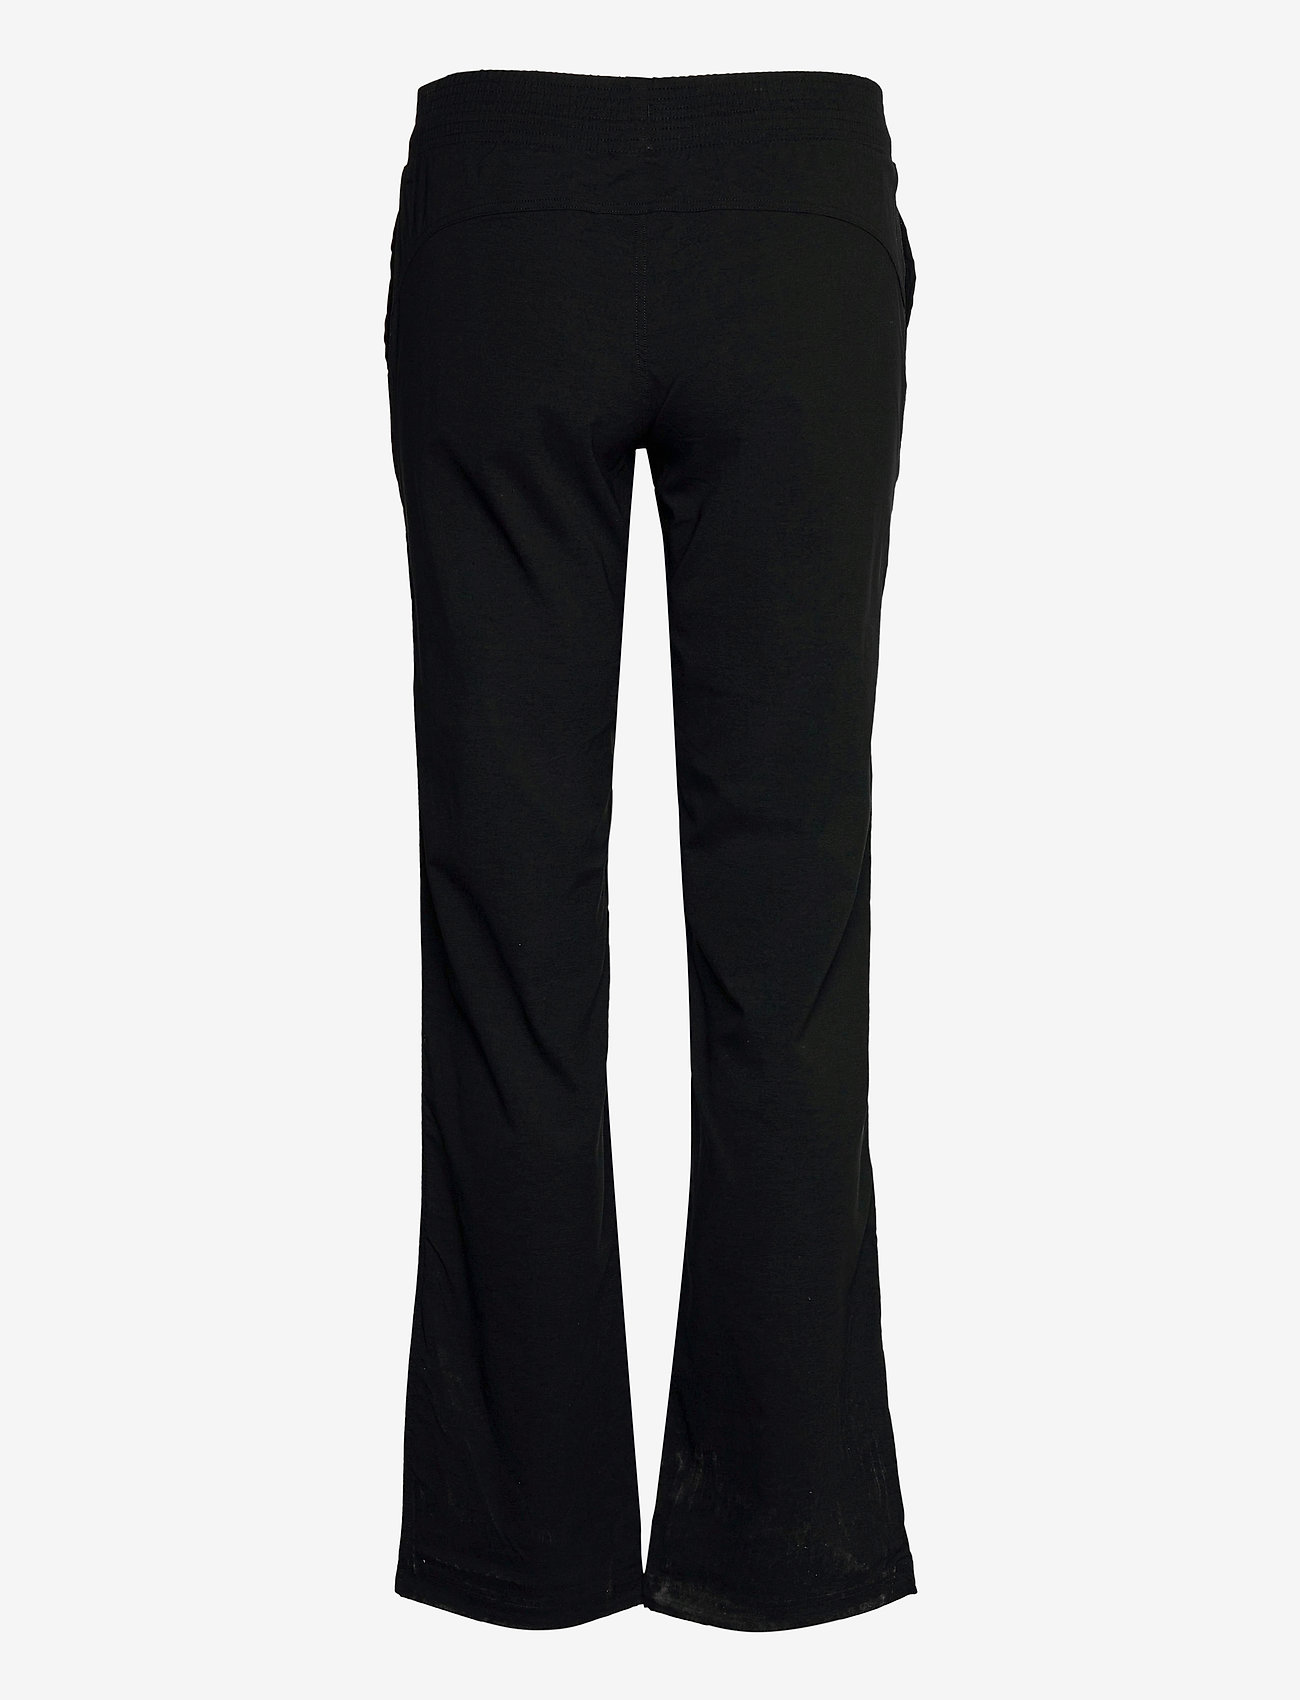 Casall - Essential Flex pants - spodnie treningowe - black - 1